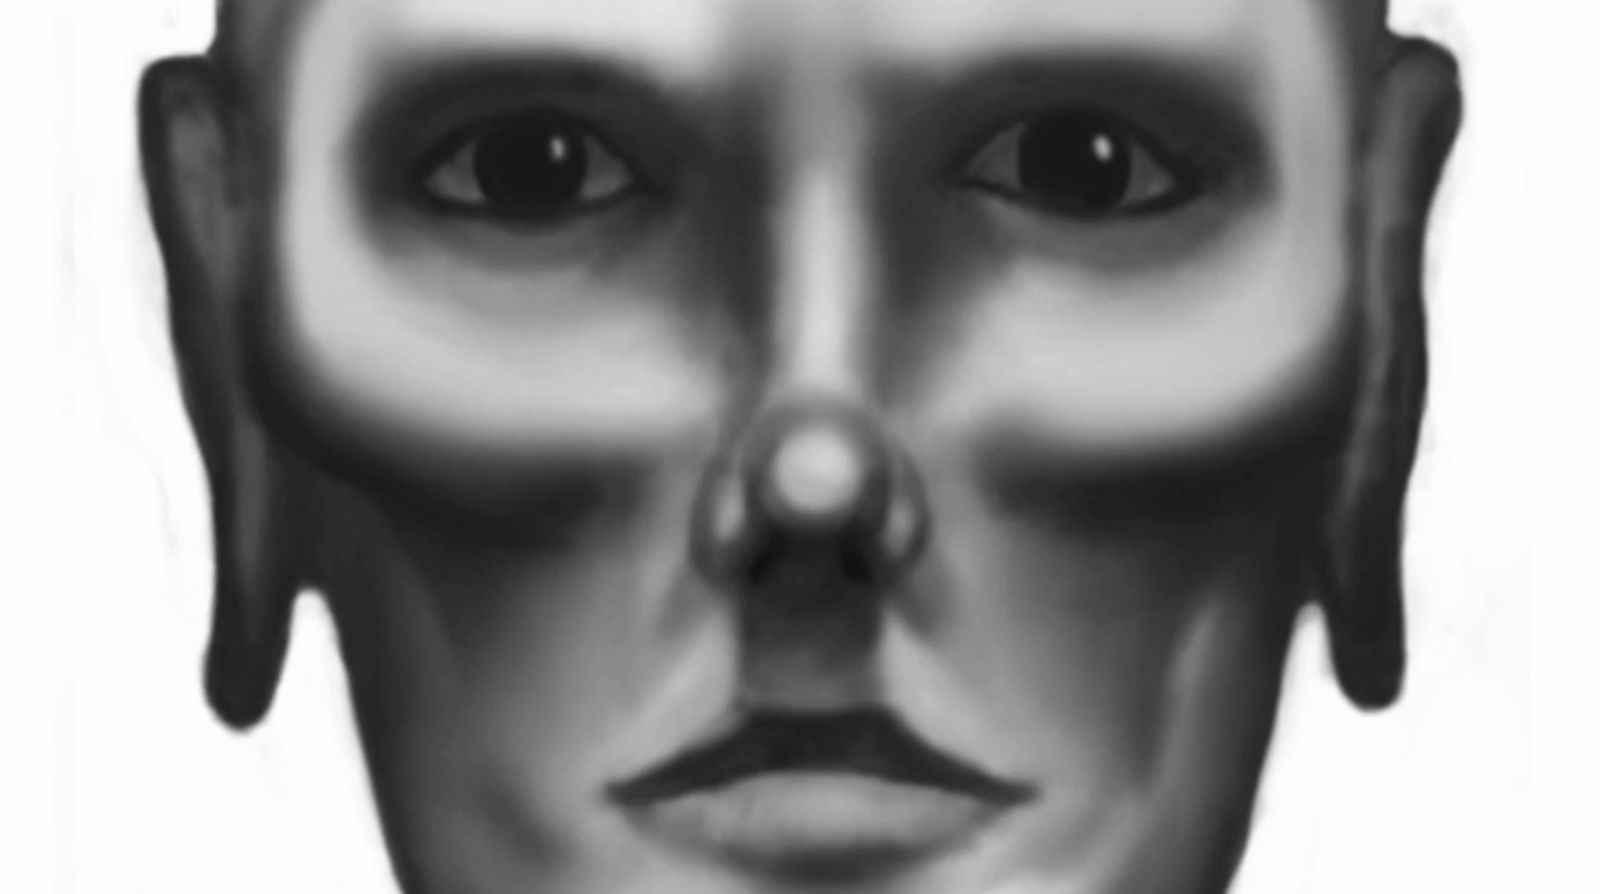 17_sentinel_face.jpg